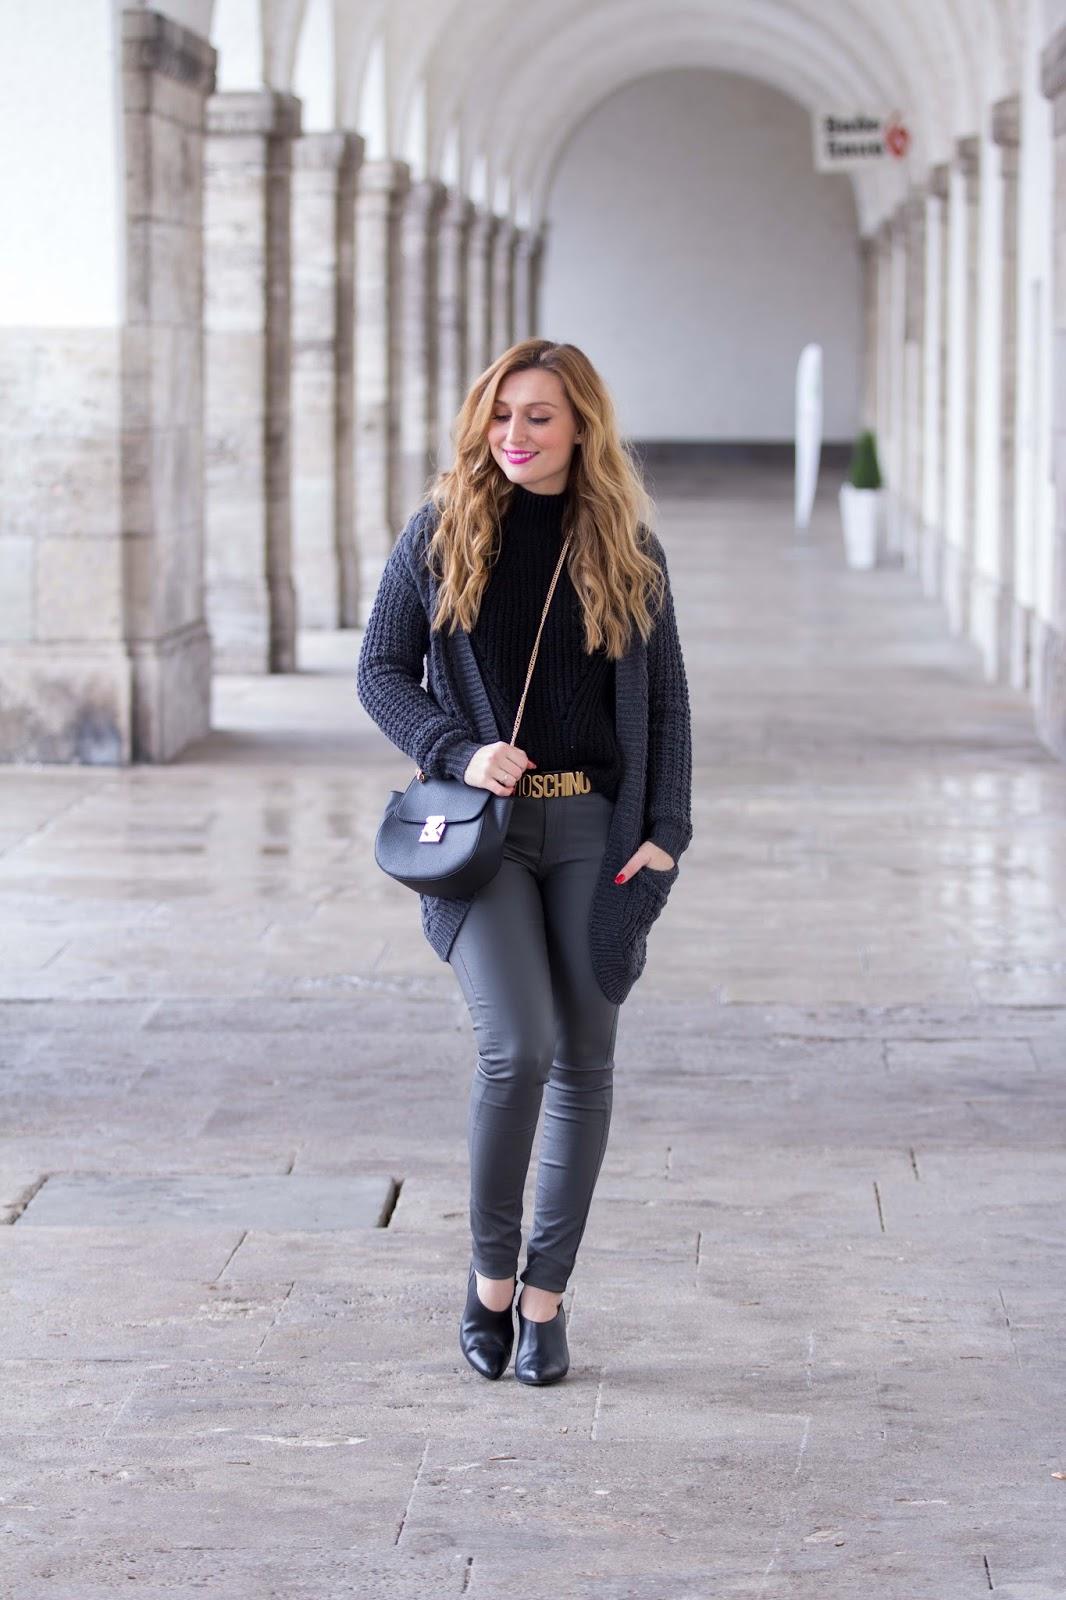 Casual-look-outfitispiration-winter-blogger-fashionstylebyjohanna-chloe-drew-lifestyleblogger-frankfurt-fashionblogger-blogger-aus-deutschland-deutsche-fashionblogger-Fashionstylebyjohanna